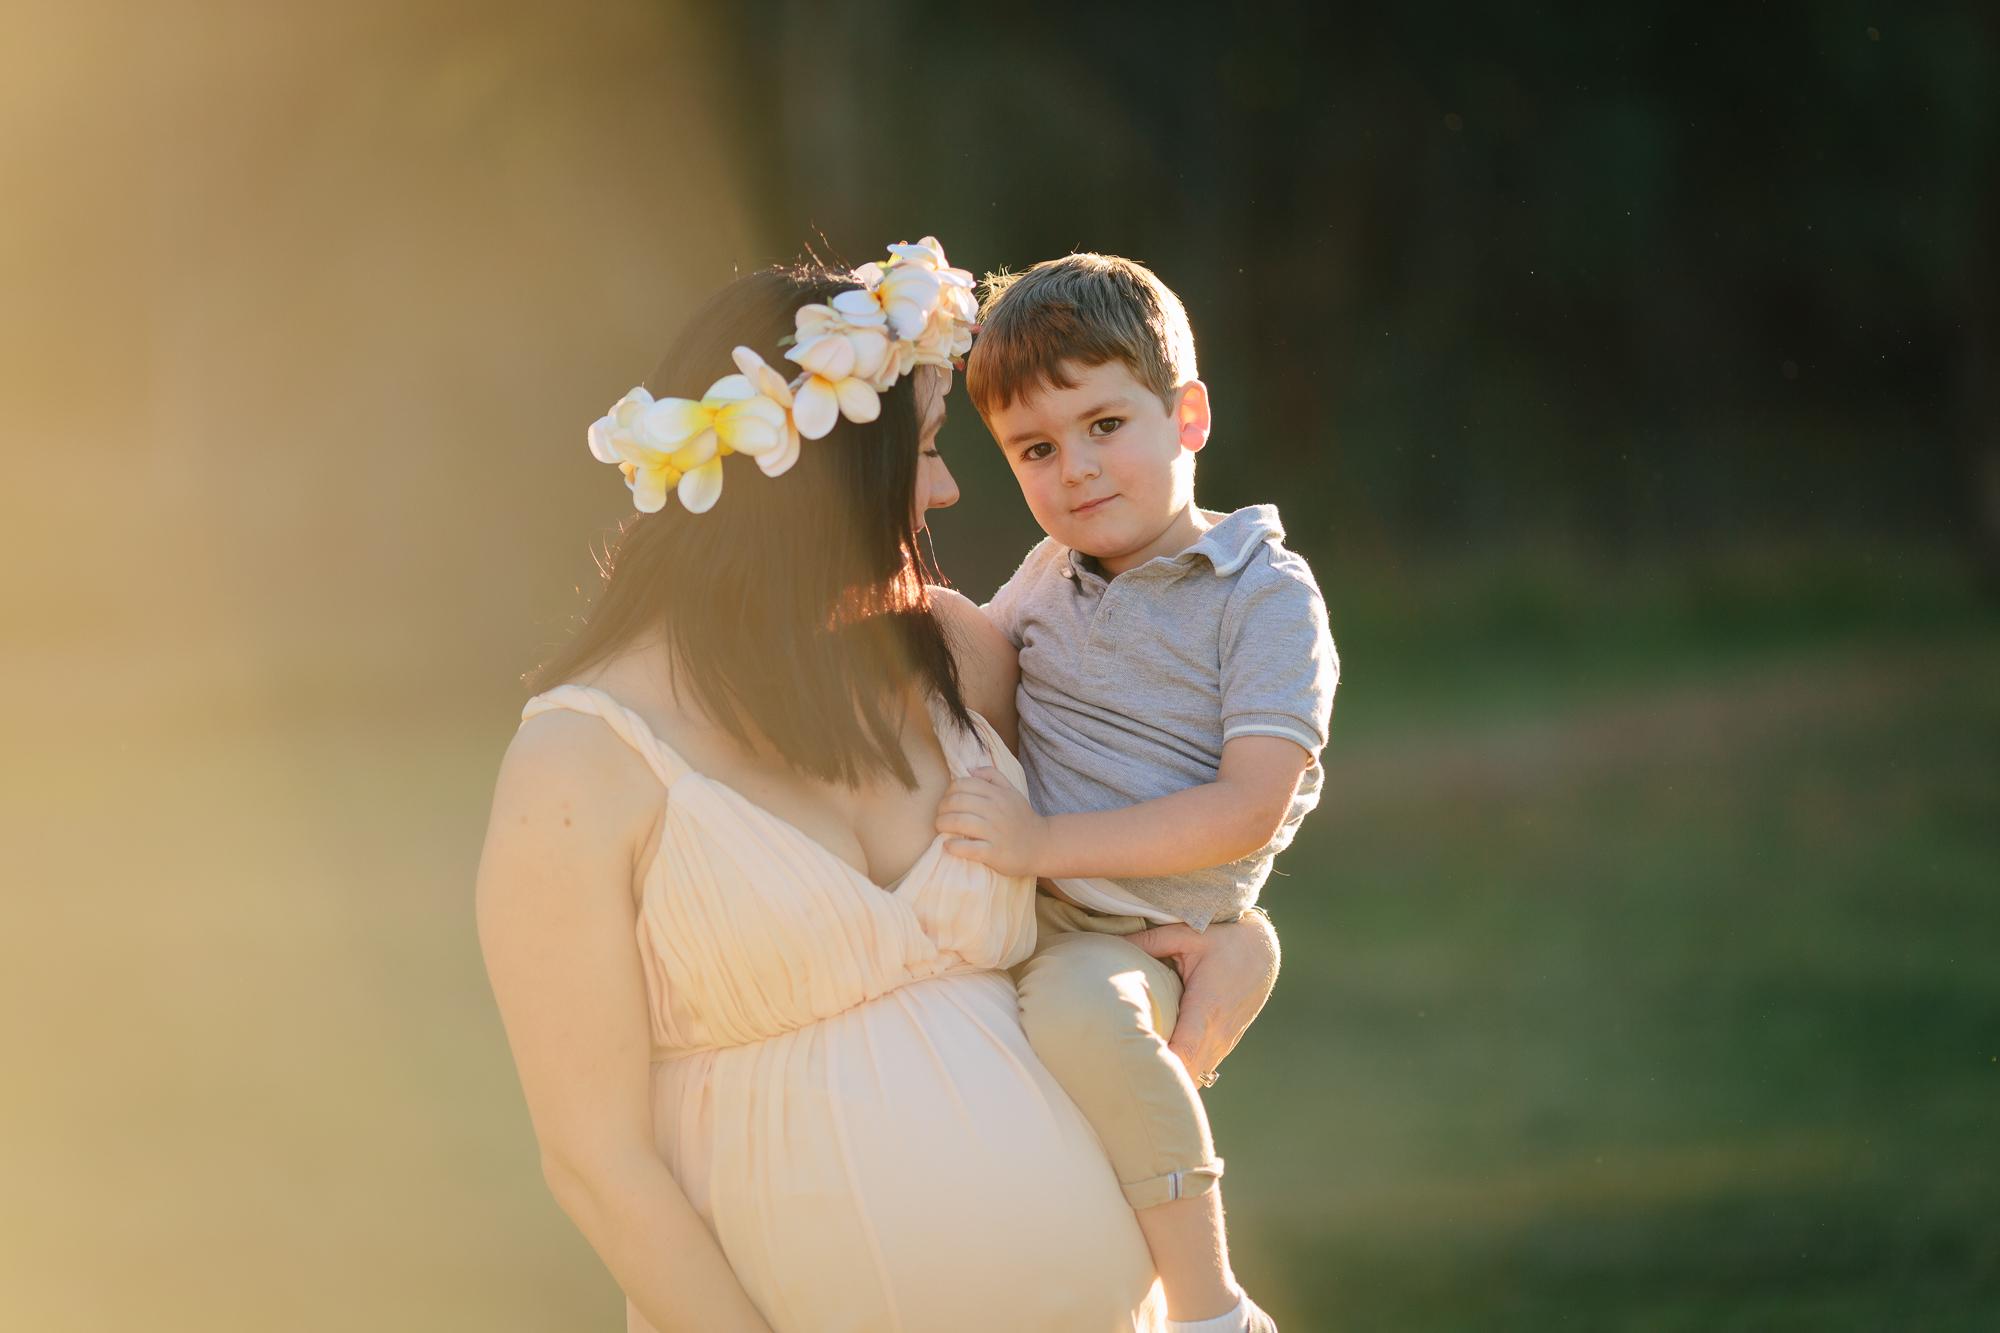 076_Maternity Lifetsyle_Shelley_Sunlight Photography.JPG